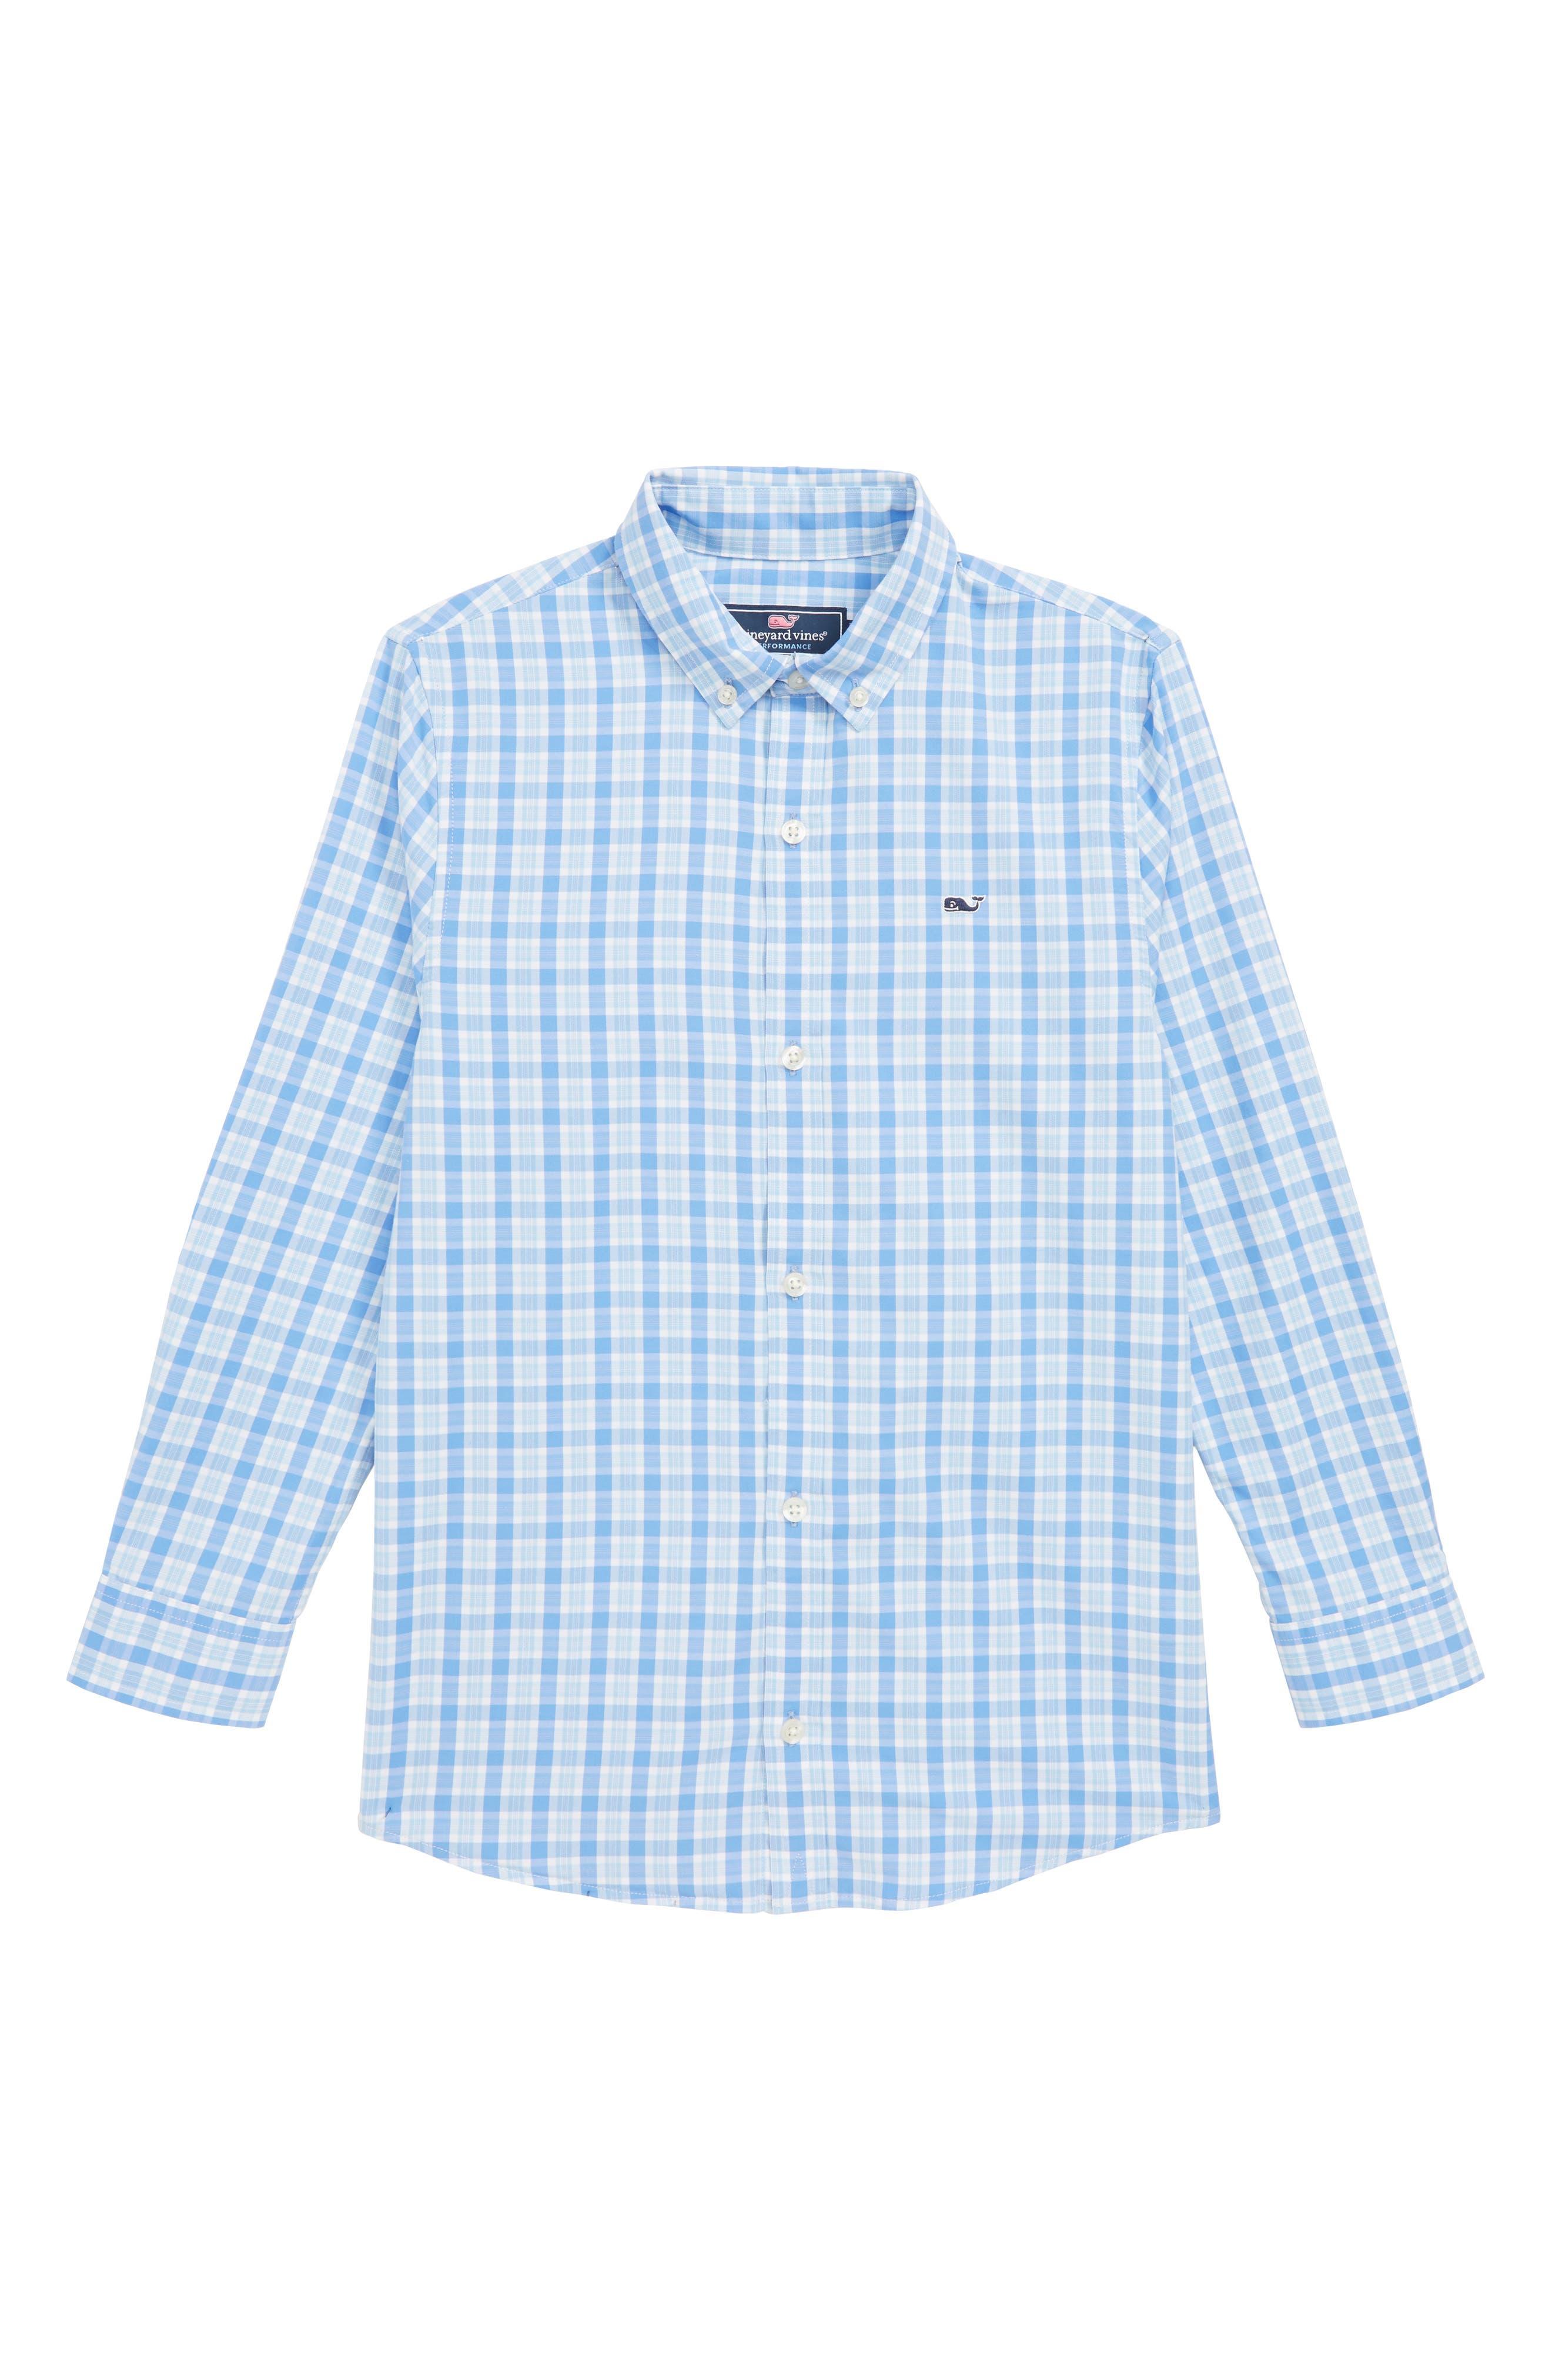 Performance Check Sport Shirt,                             Main thumbnail 1, color,                             BAYSIDE BLUE